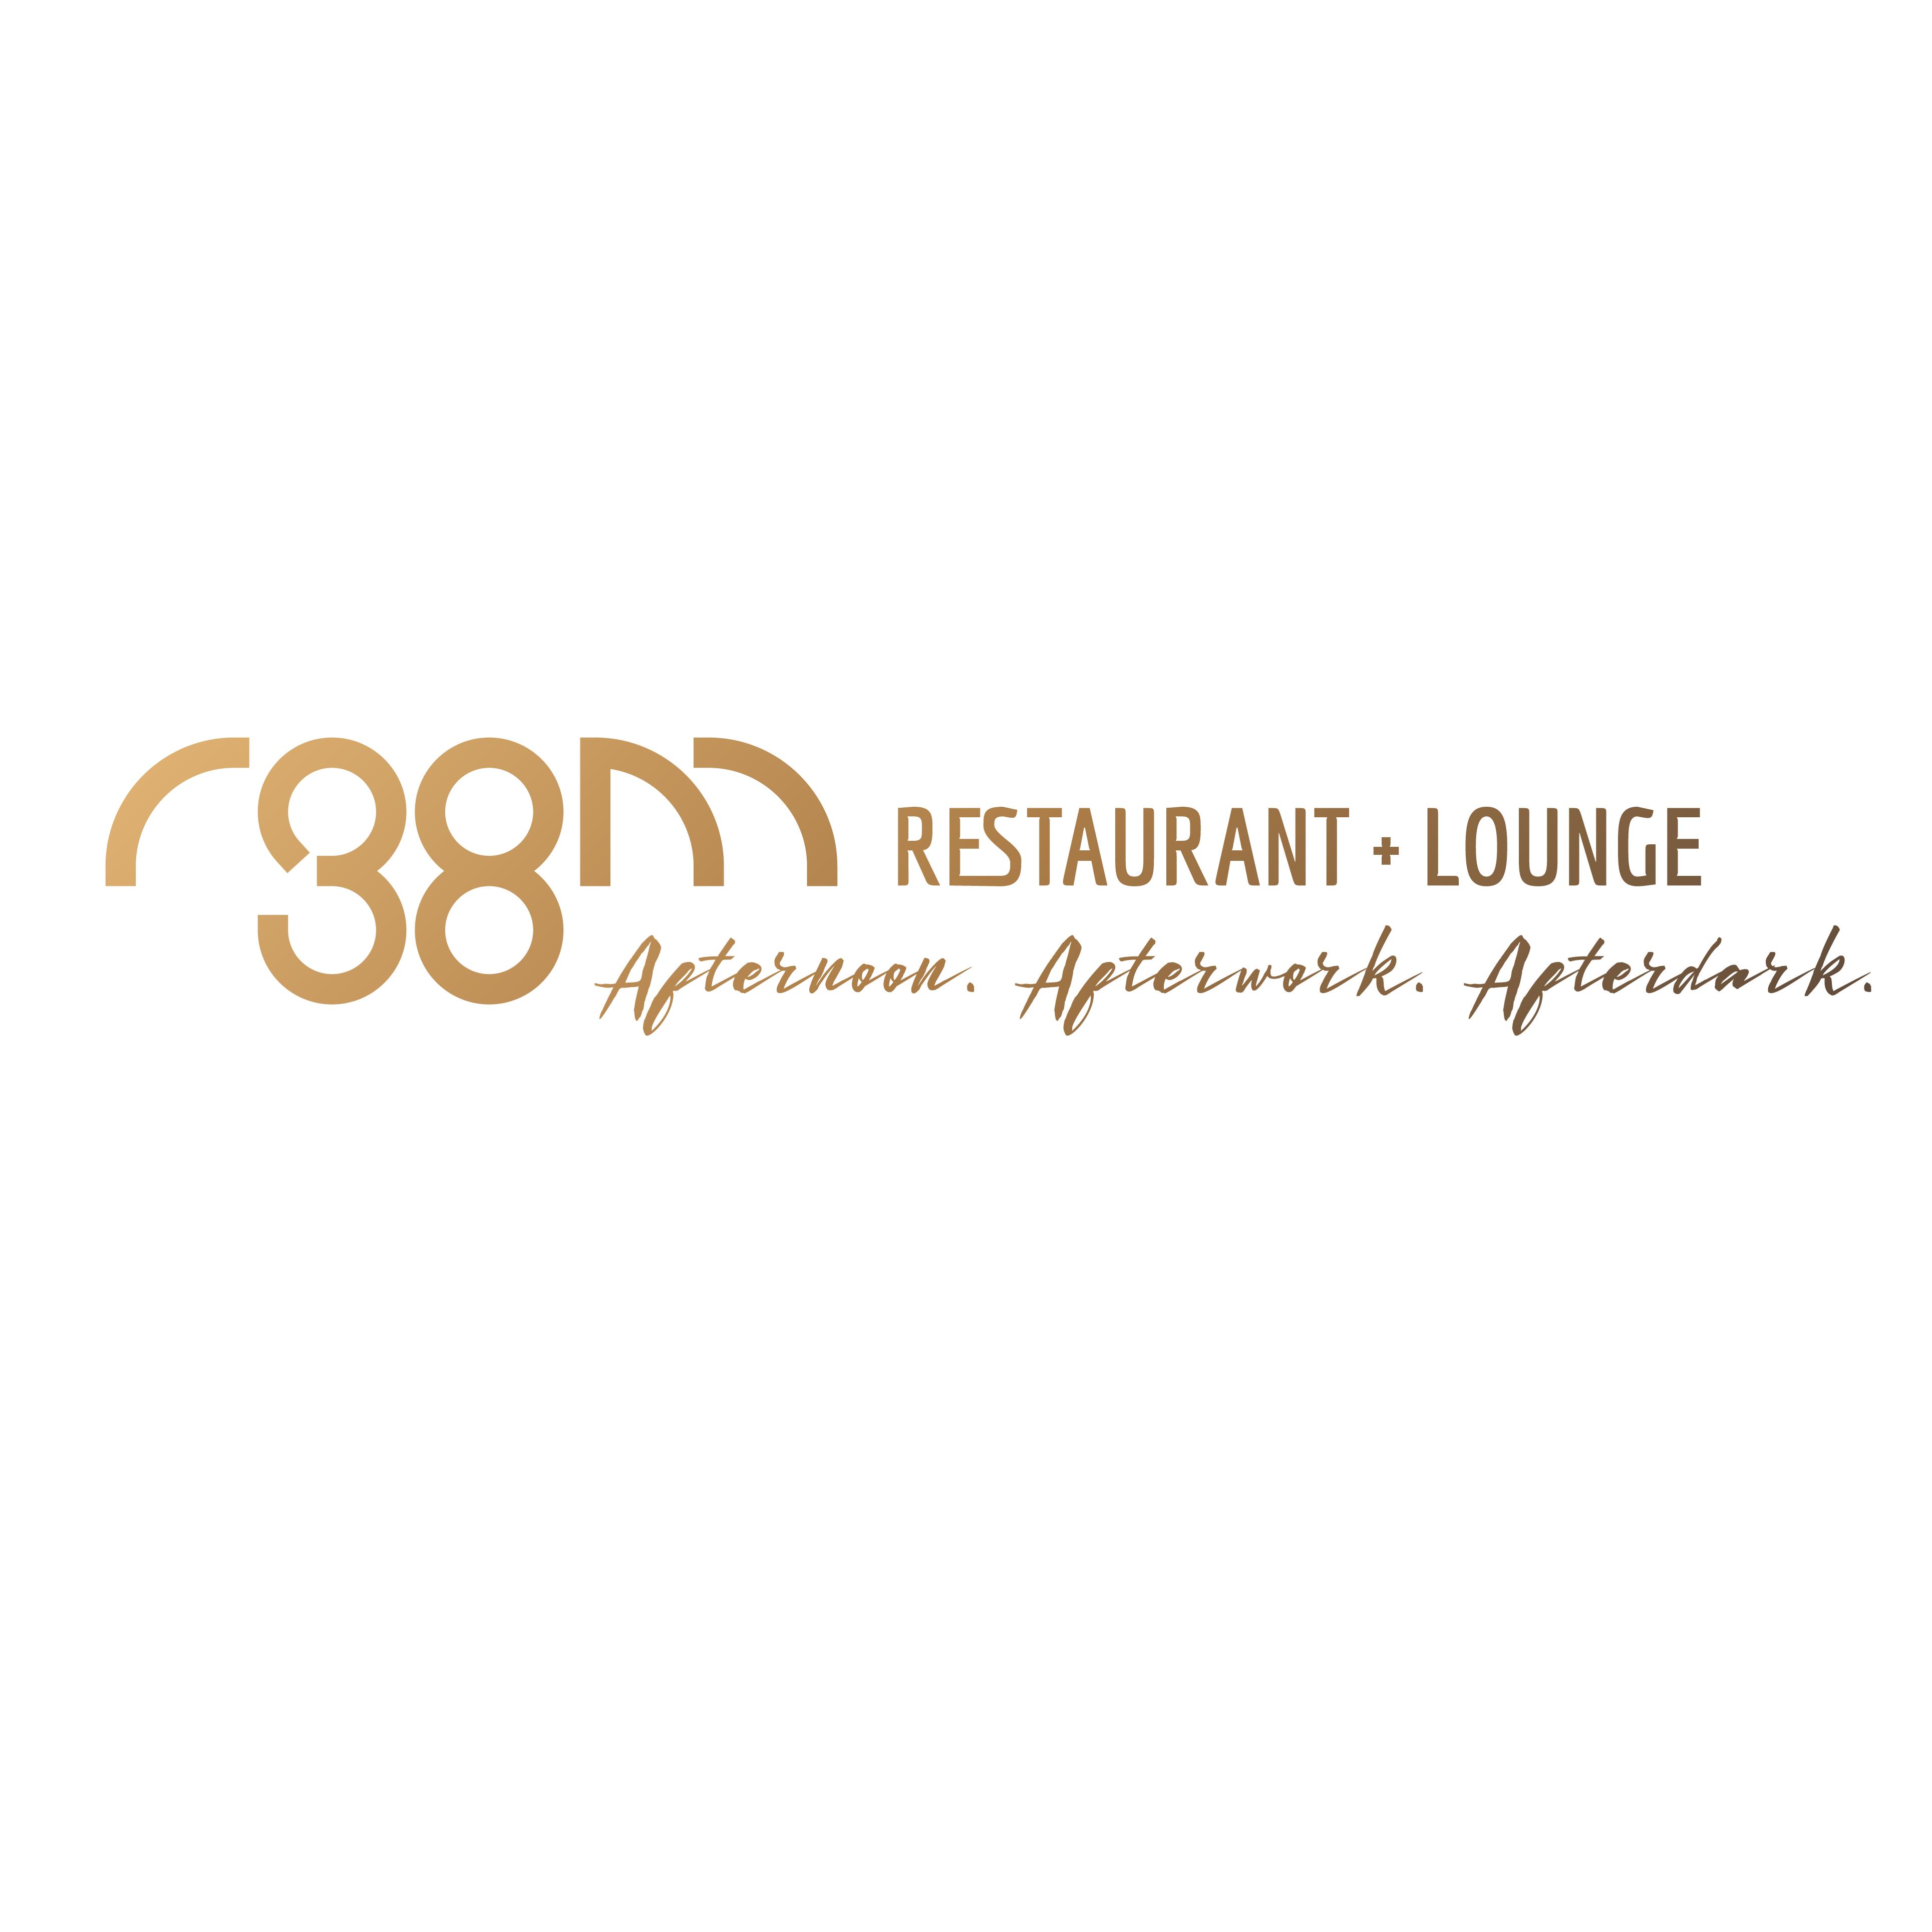 Room 38 Restaurant & Lounge